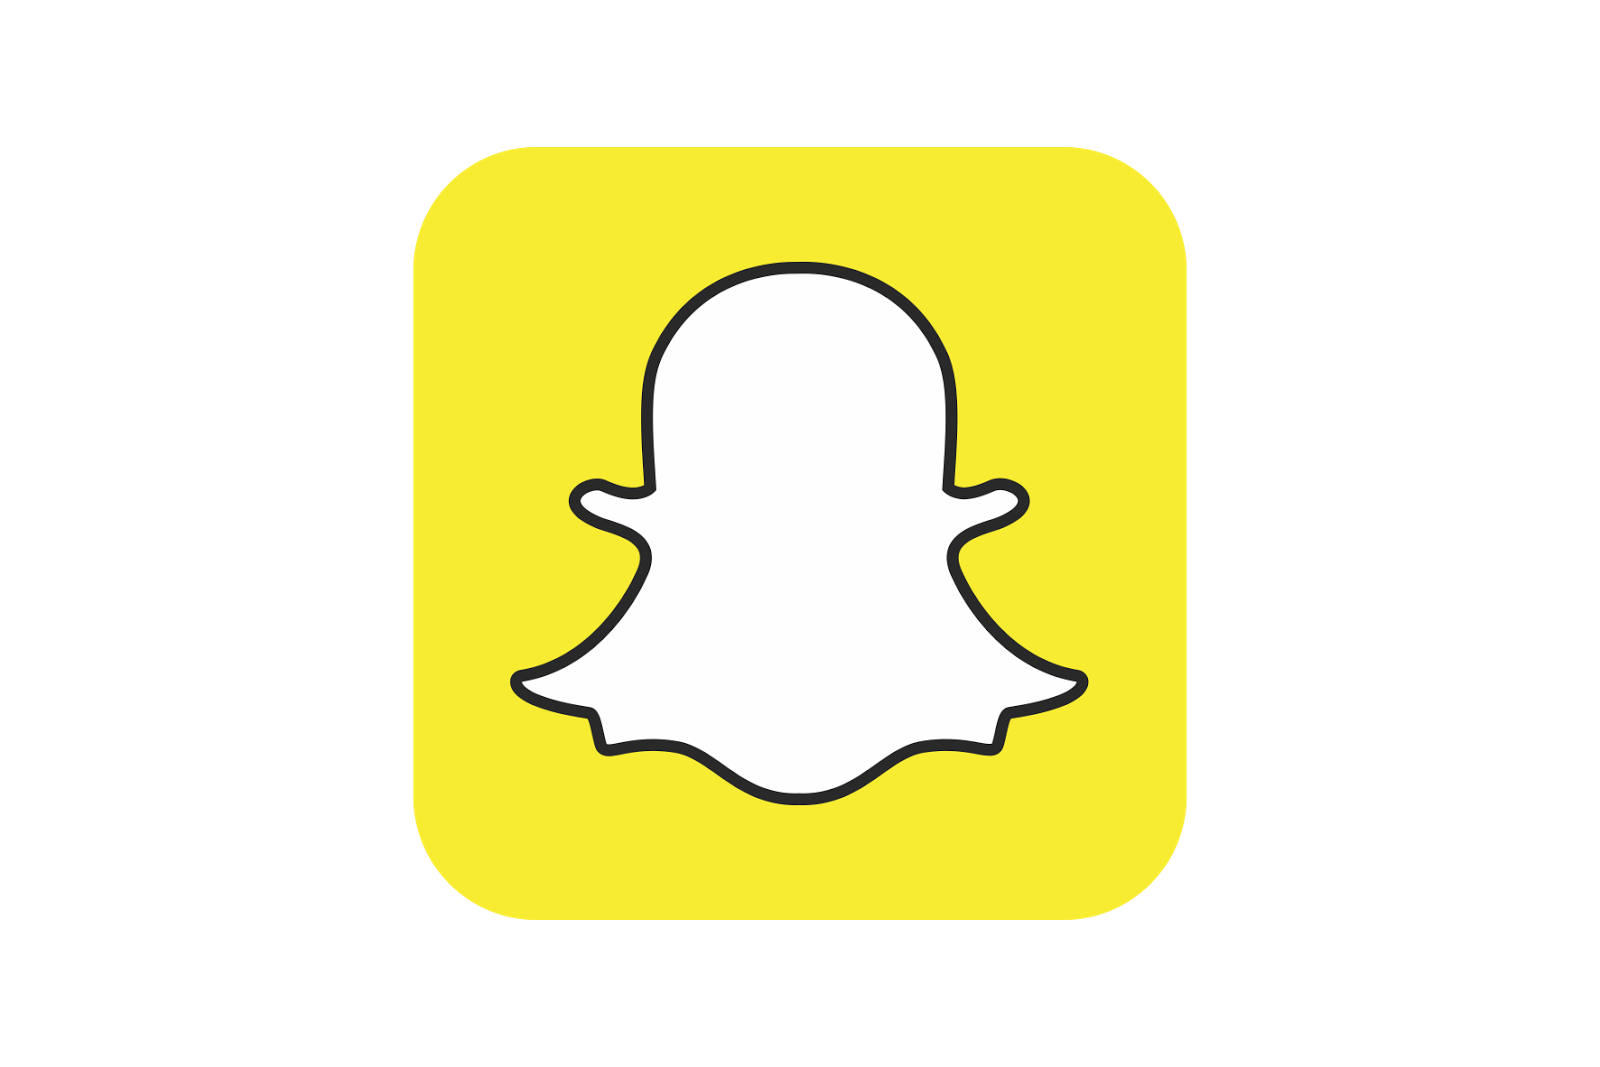 snap story socialmedia socialnetwork snapchat logo snap...